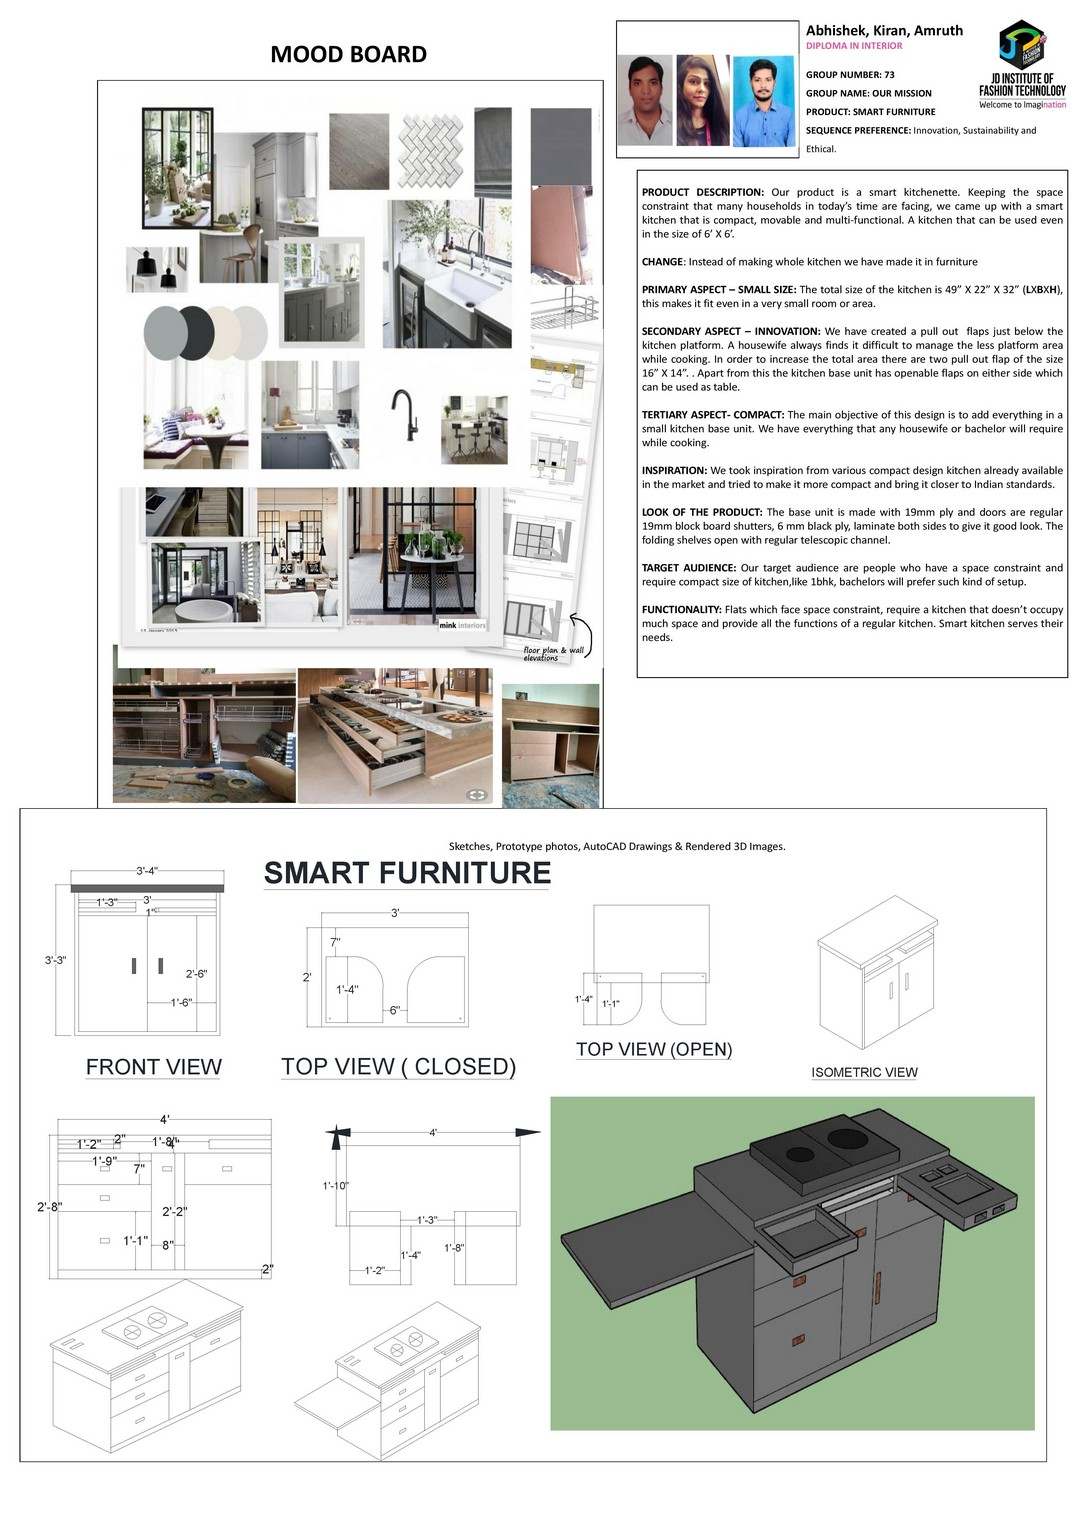 Smart Furniture – Change – JD Annual Design Awards 2018 | Designer: Abhishek Anurag, Amruth Nayaks and Kiran Patel | Photography : Jerin Nath (@jerin_nath) smart furniture Smart Furniture – Change – JD Annual Design Awards 2018 smart furniture1